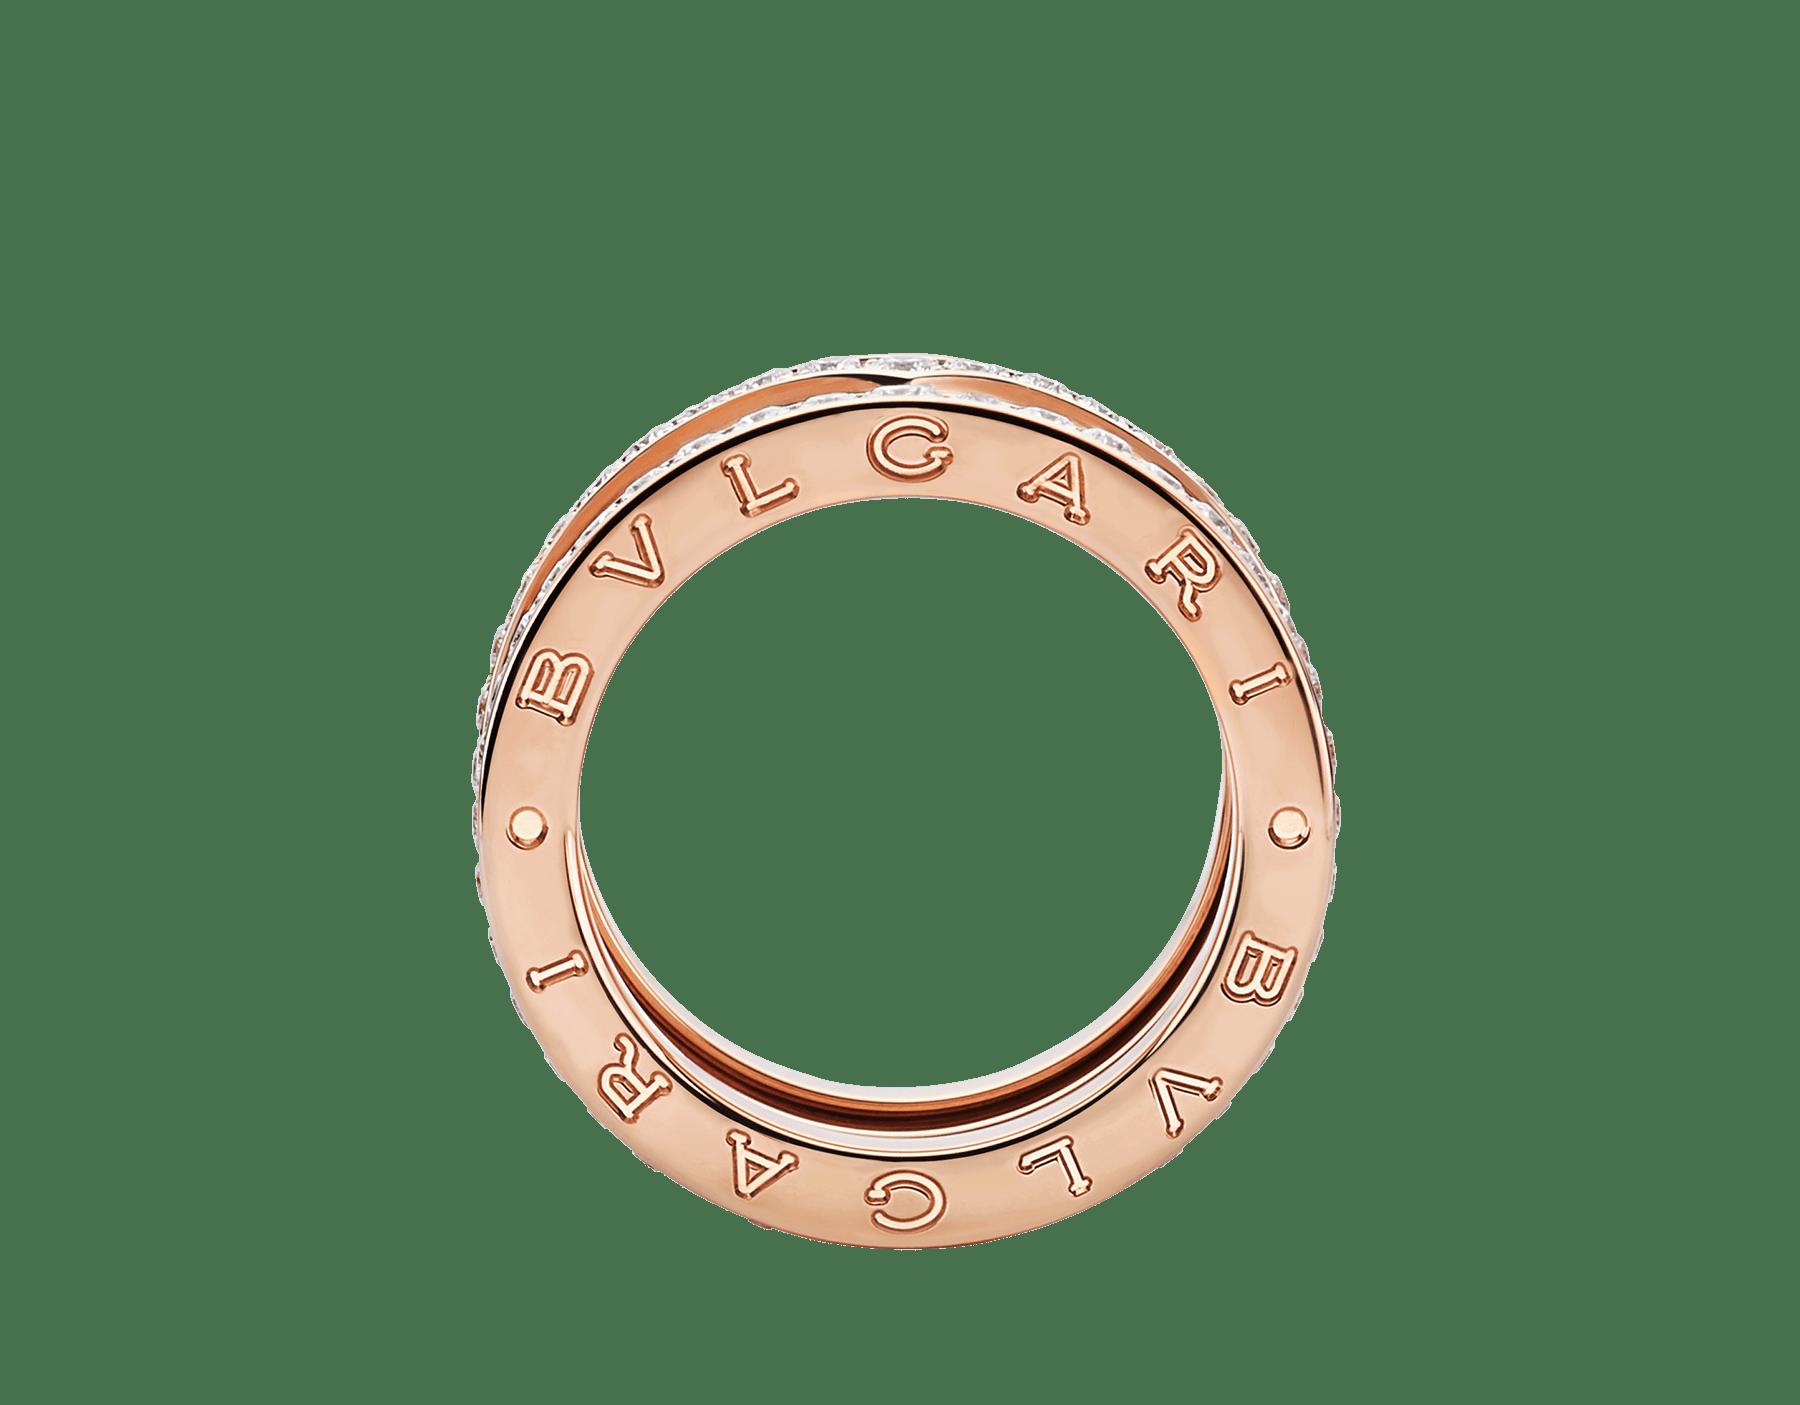 B.zero1四环戒指,18K玫瑰金材质,边缘密镶钻石。 B-zero1-4-bands-AN856293 image 2